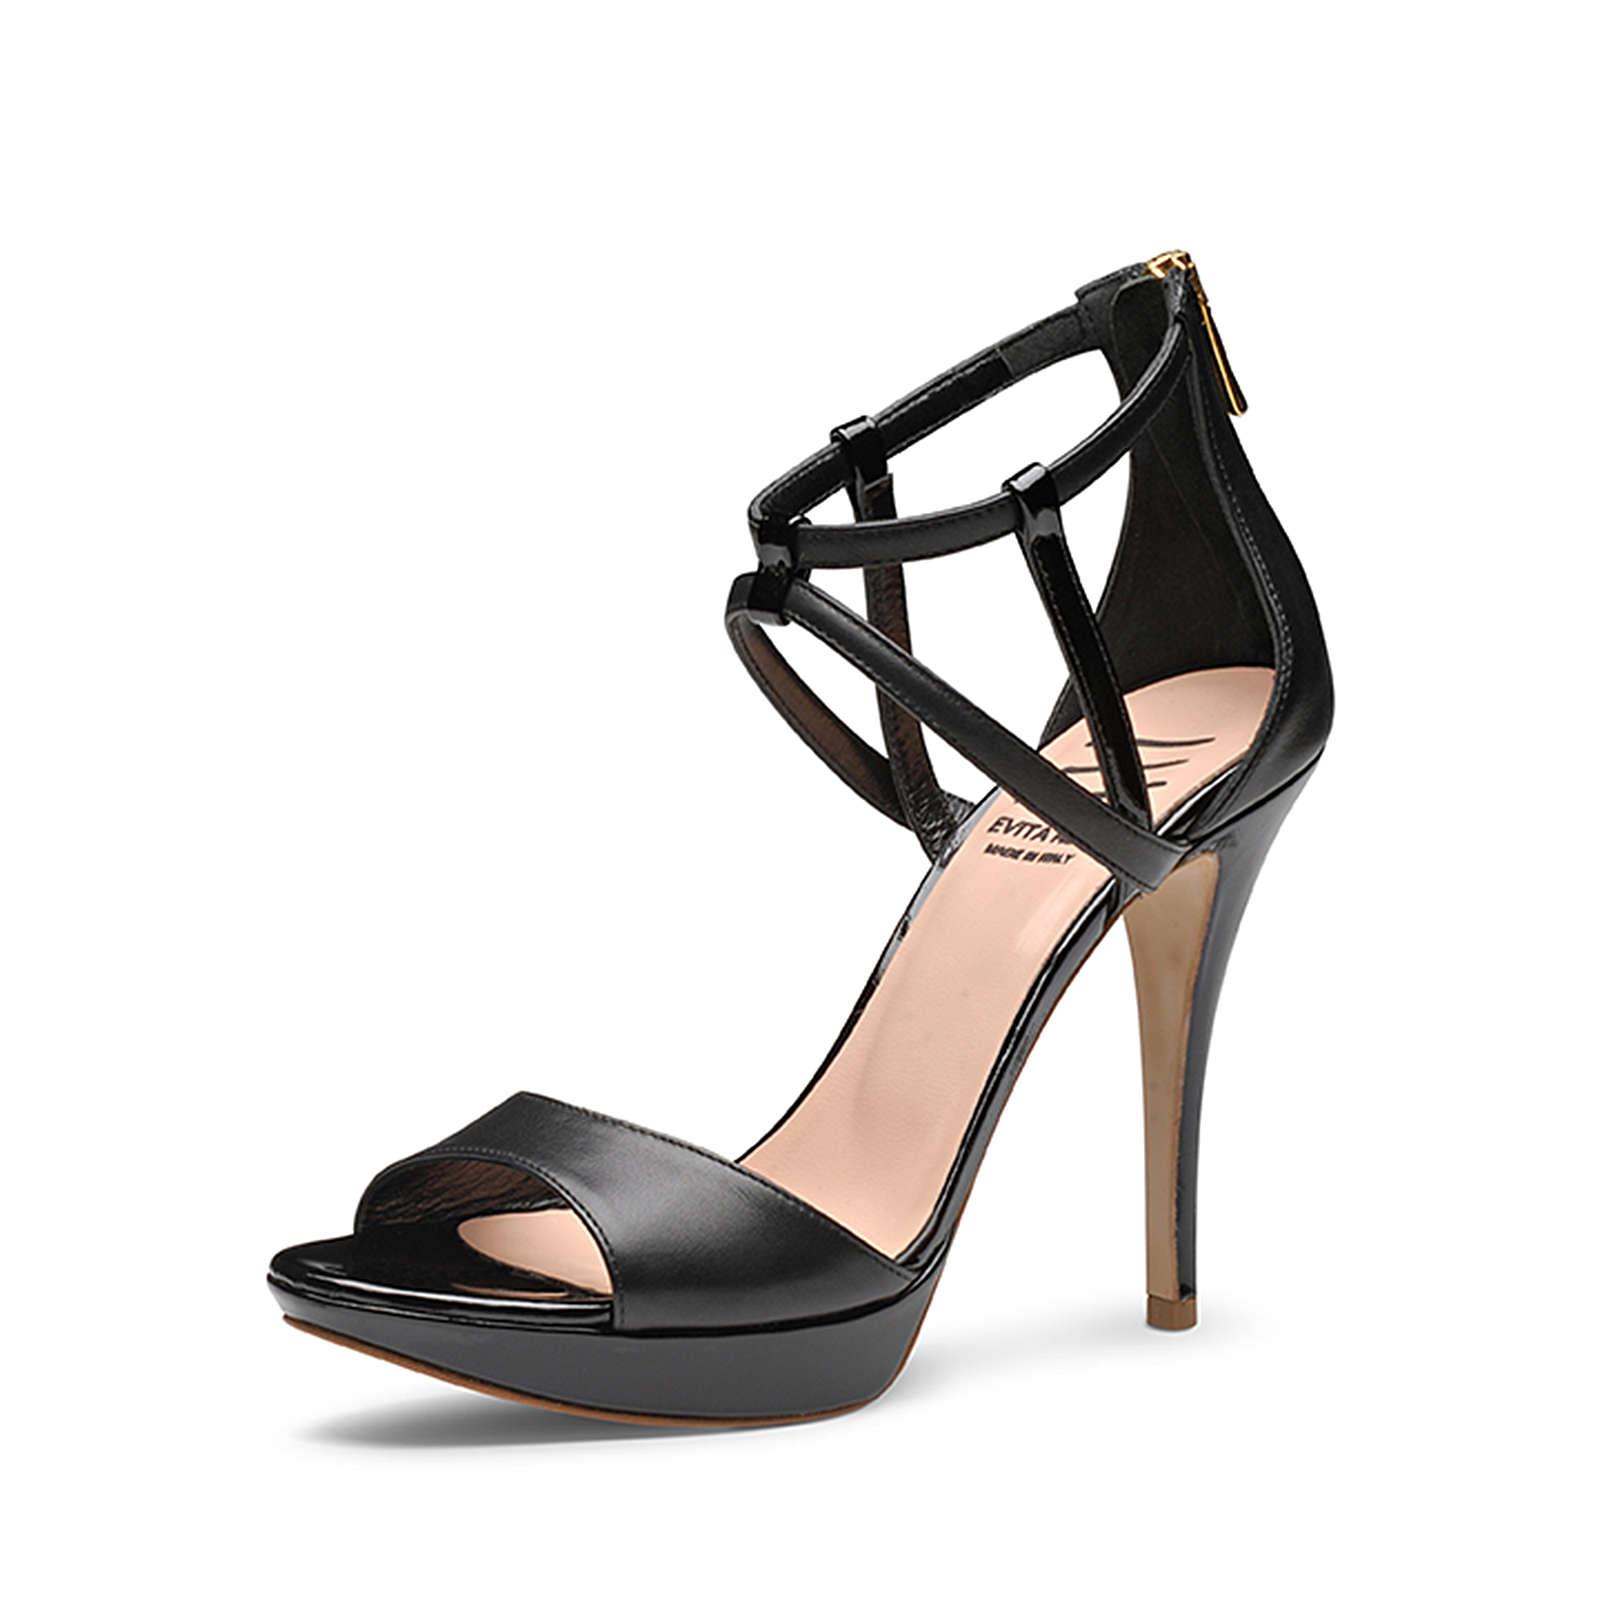 Evita Shoes Sandaletten schwarz Damen Gr. 39